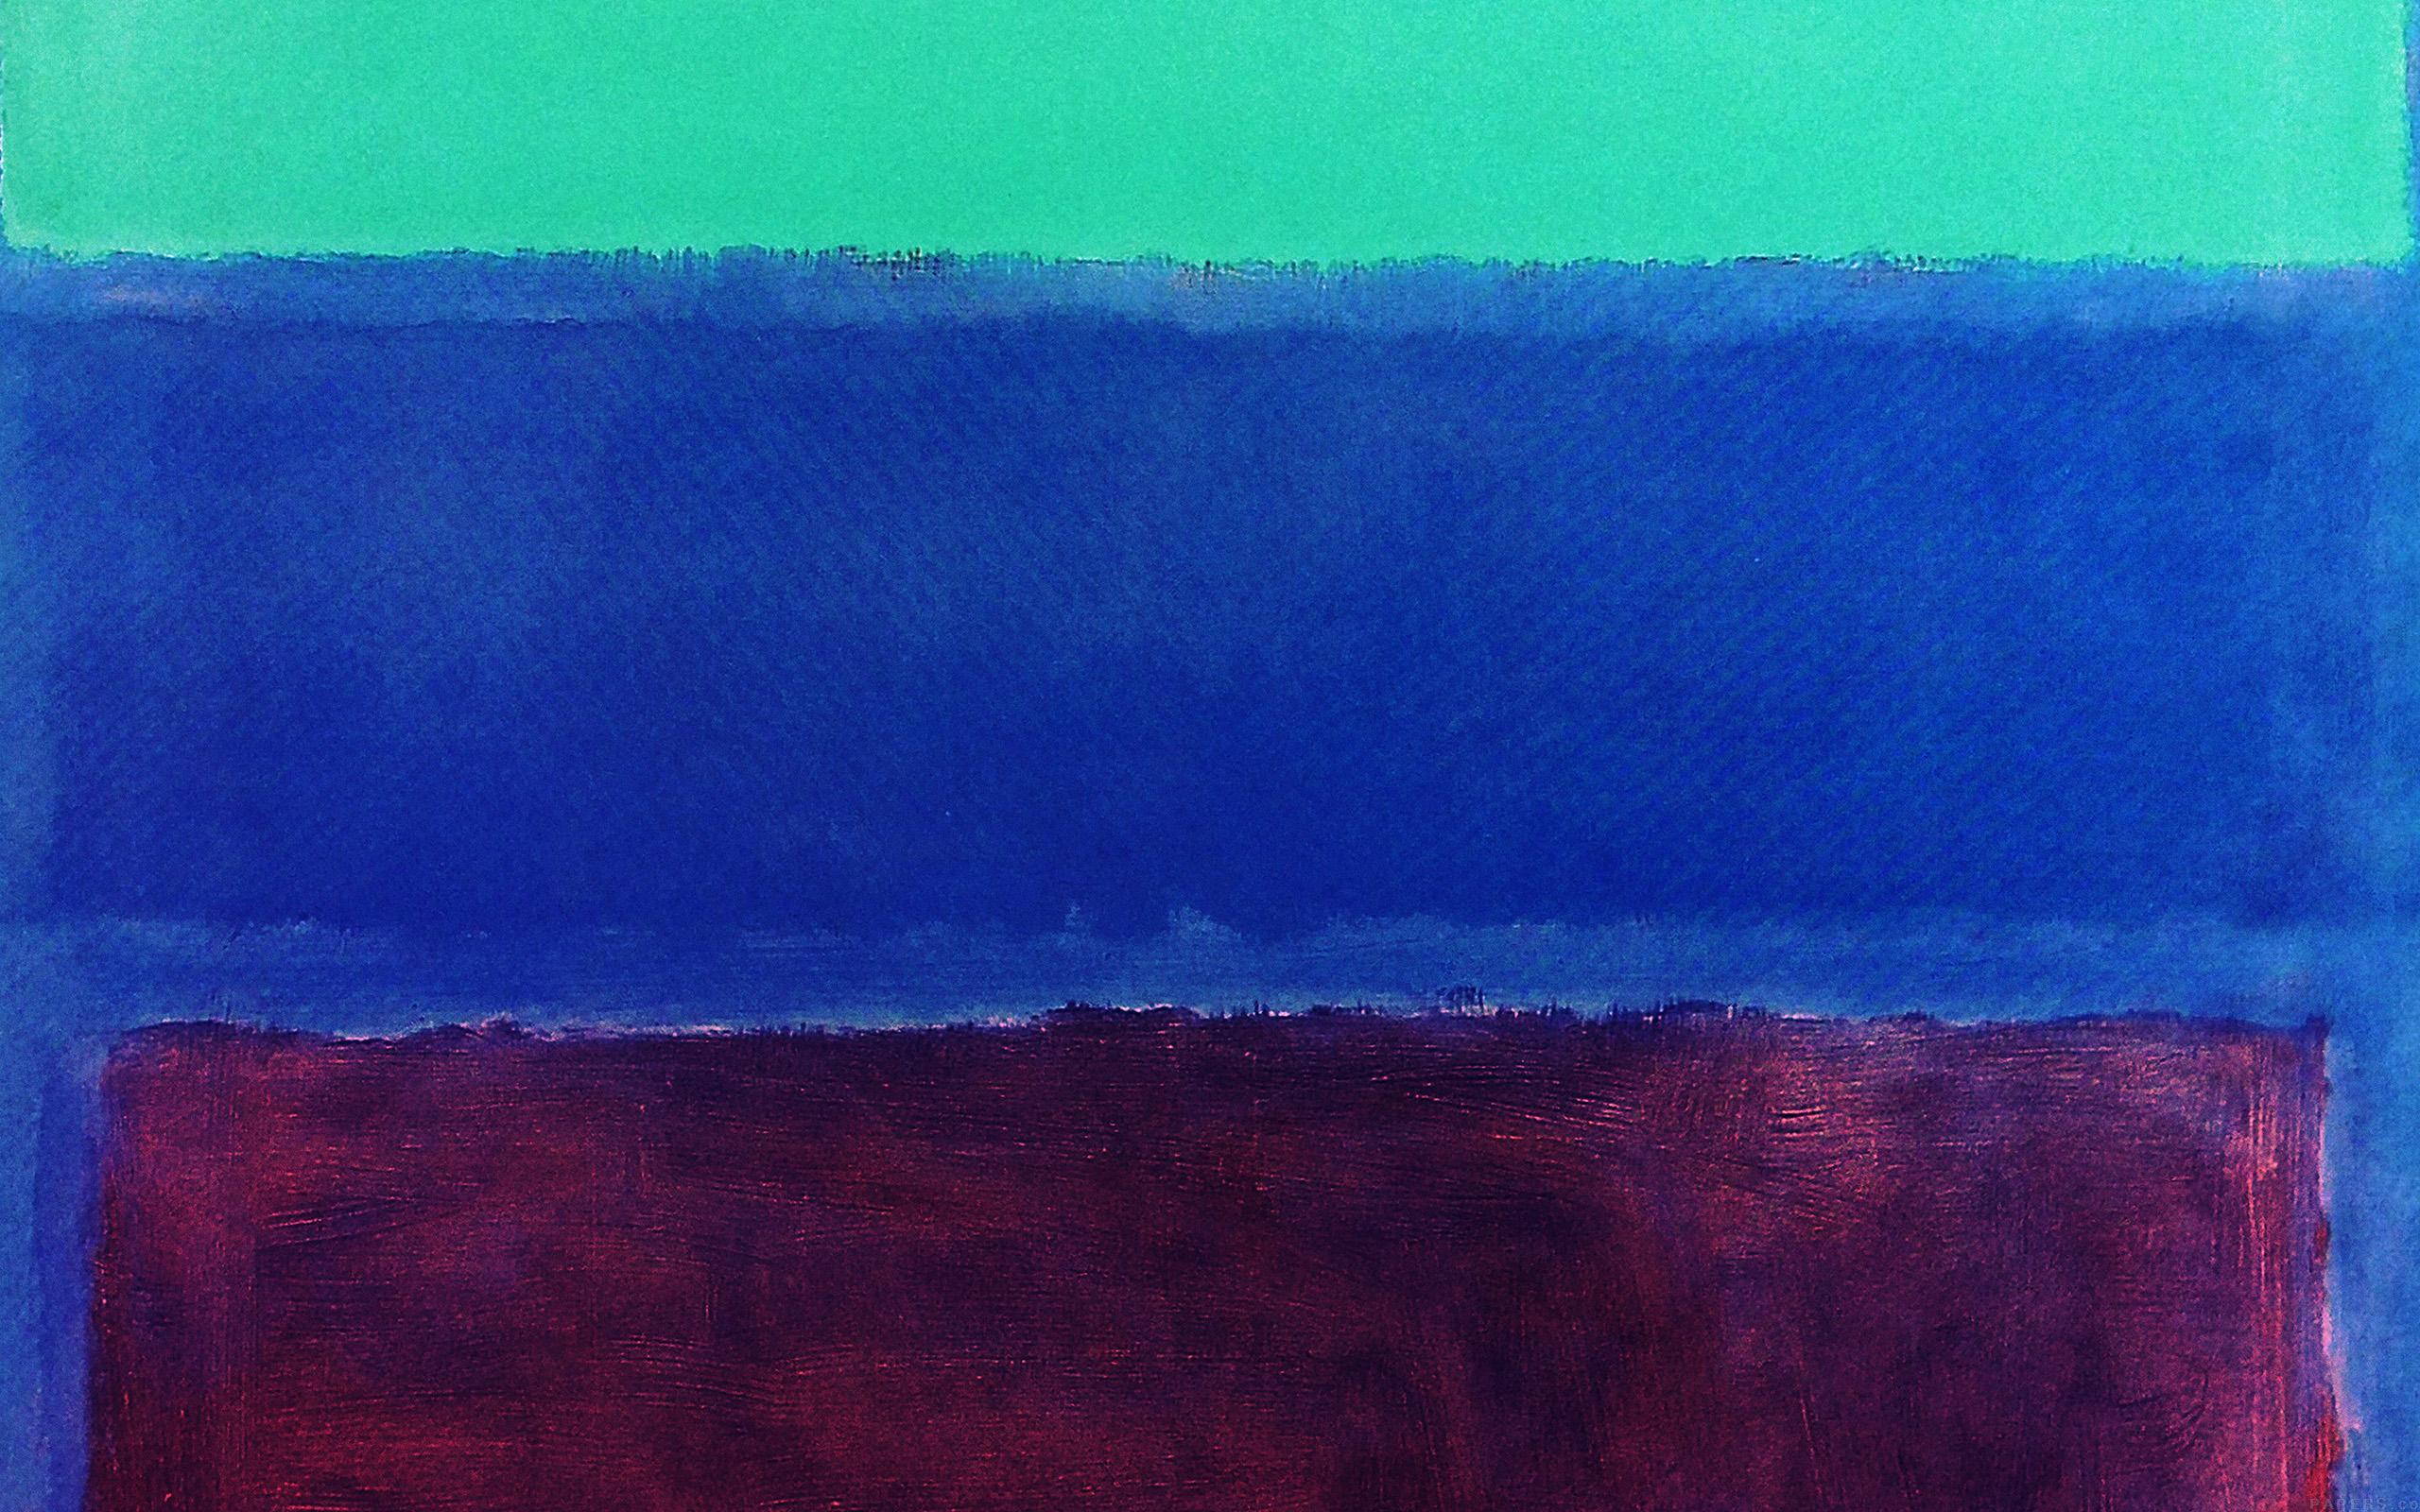 Cute Christmas Color Wallpaper Al61 Mark Rothko Style Paint Art Greeb Blue Classic Wallpaper